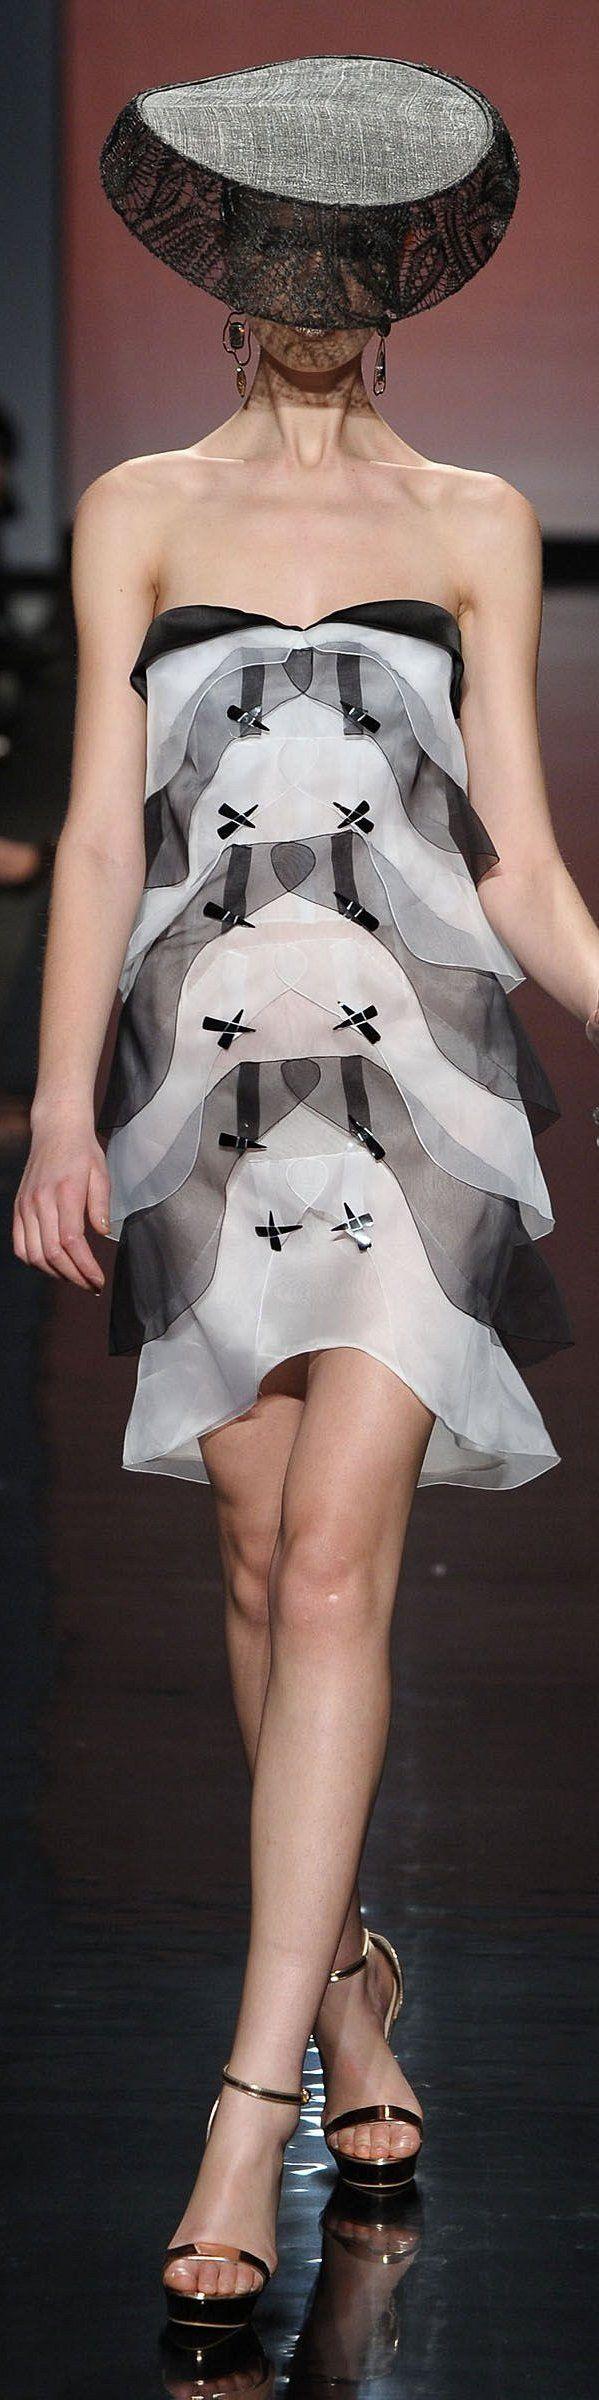 Simplicity and Elegance 'Gattinoni' Spring-Summer 2013 Haute Couture Rome